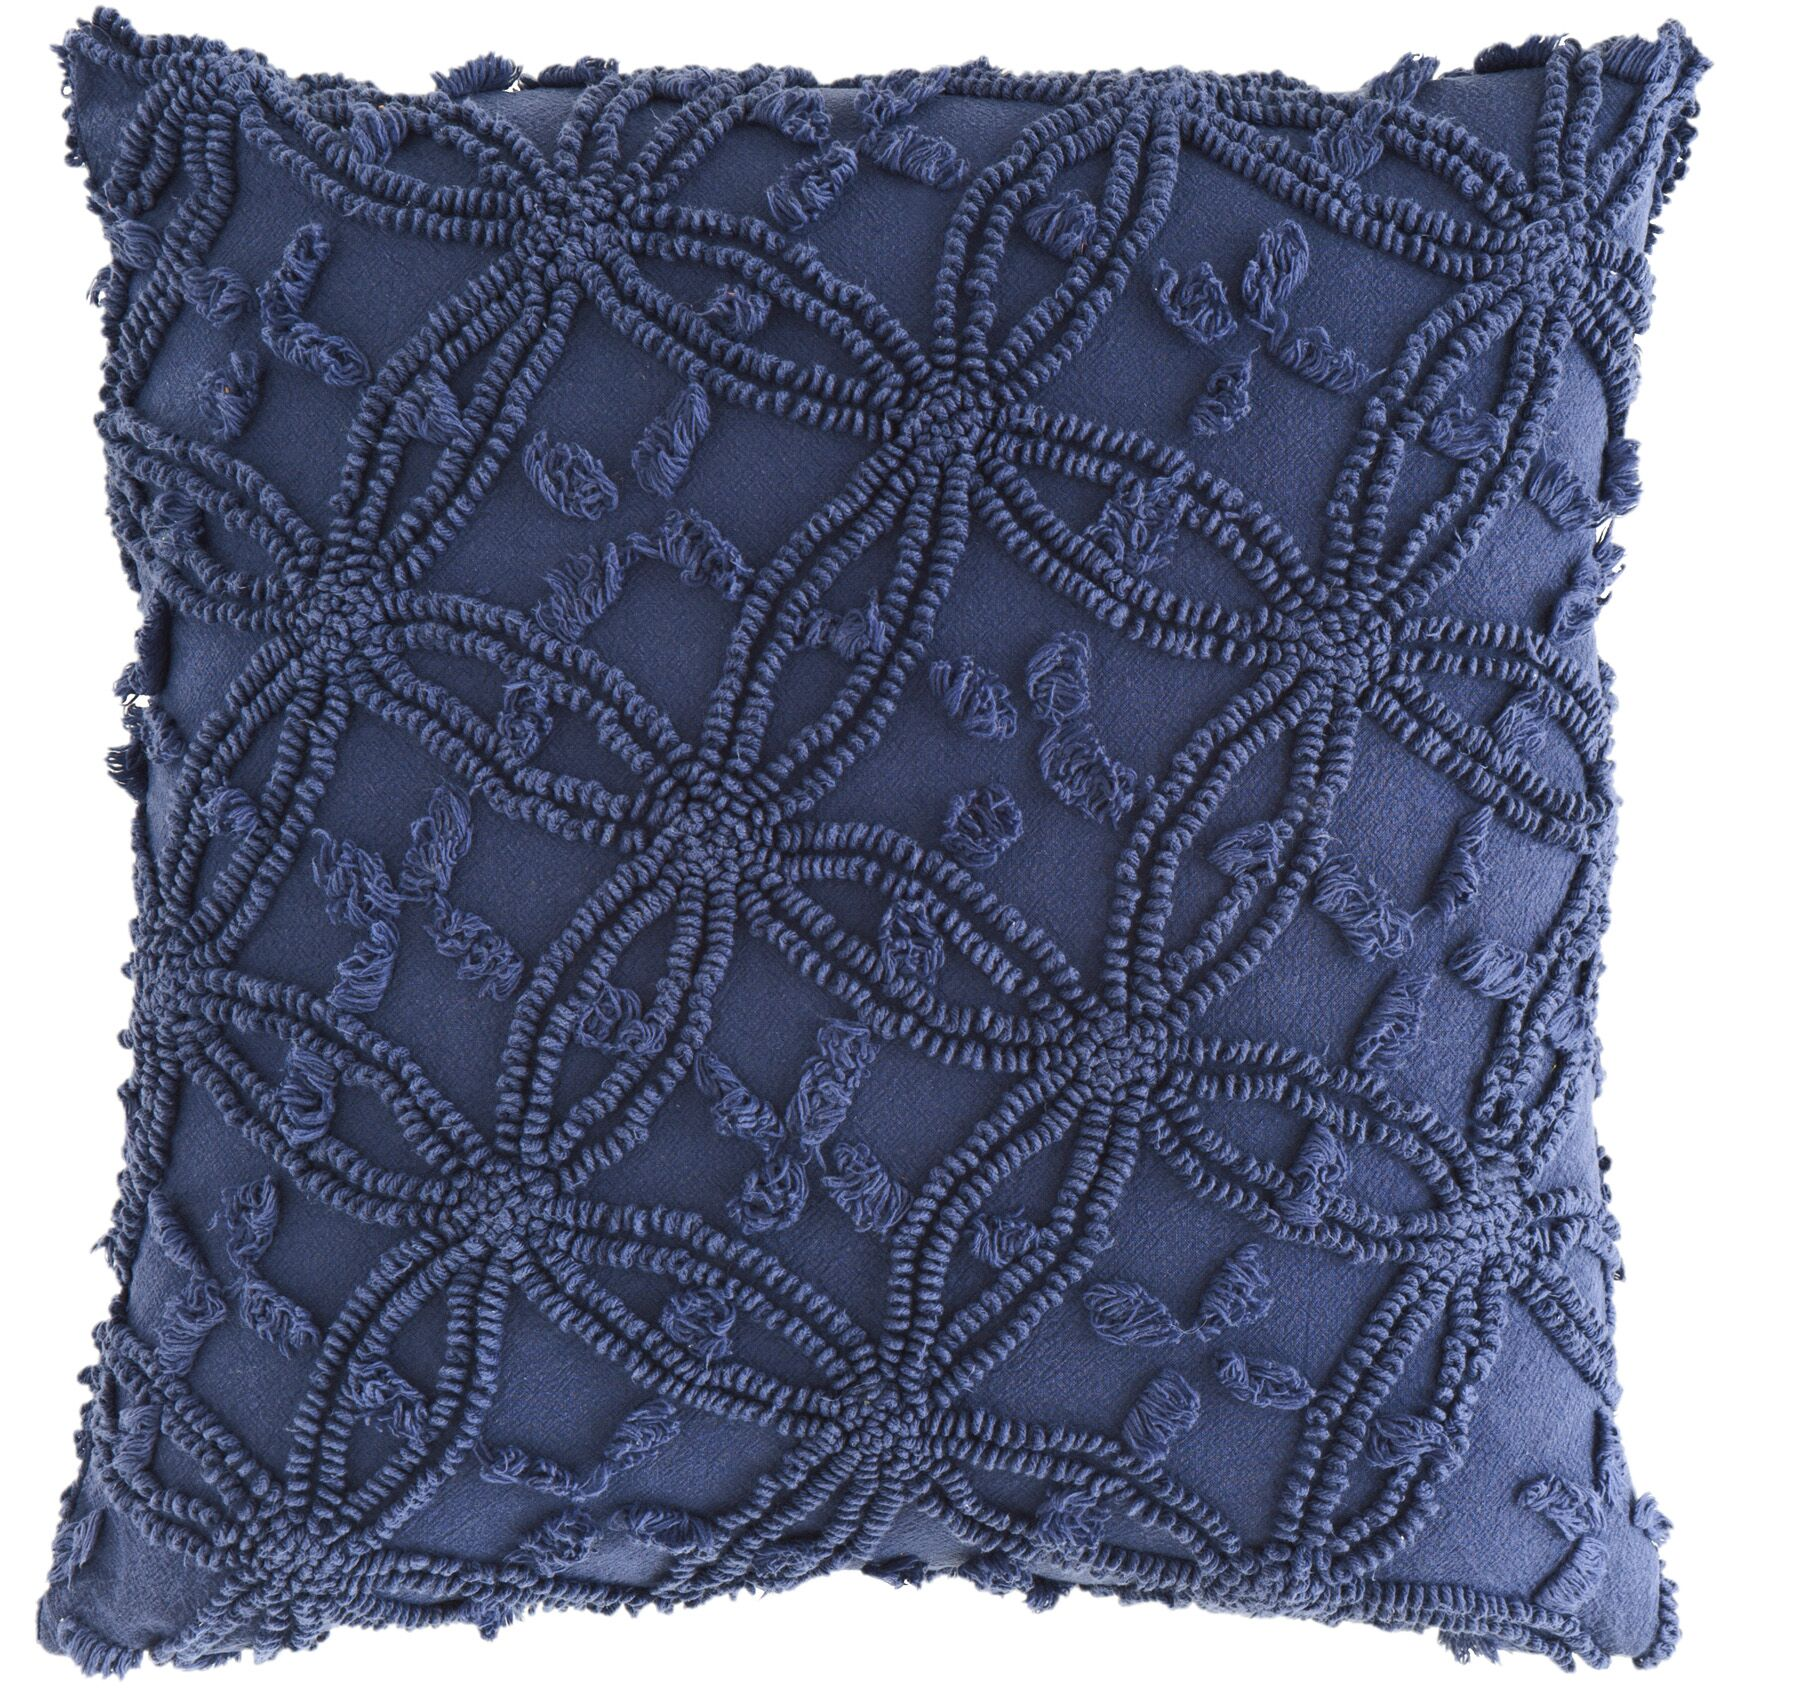 Candlewick Cotton Throw Pillow Size: 18